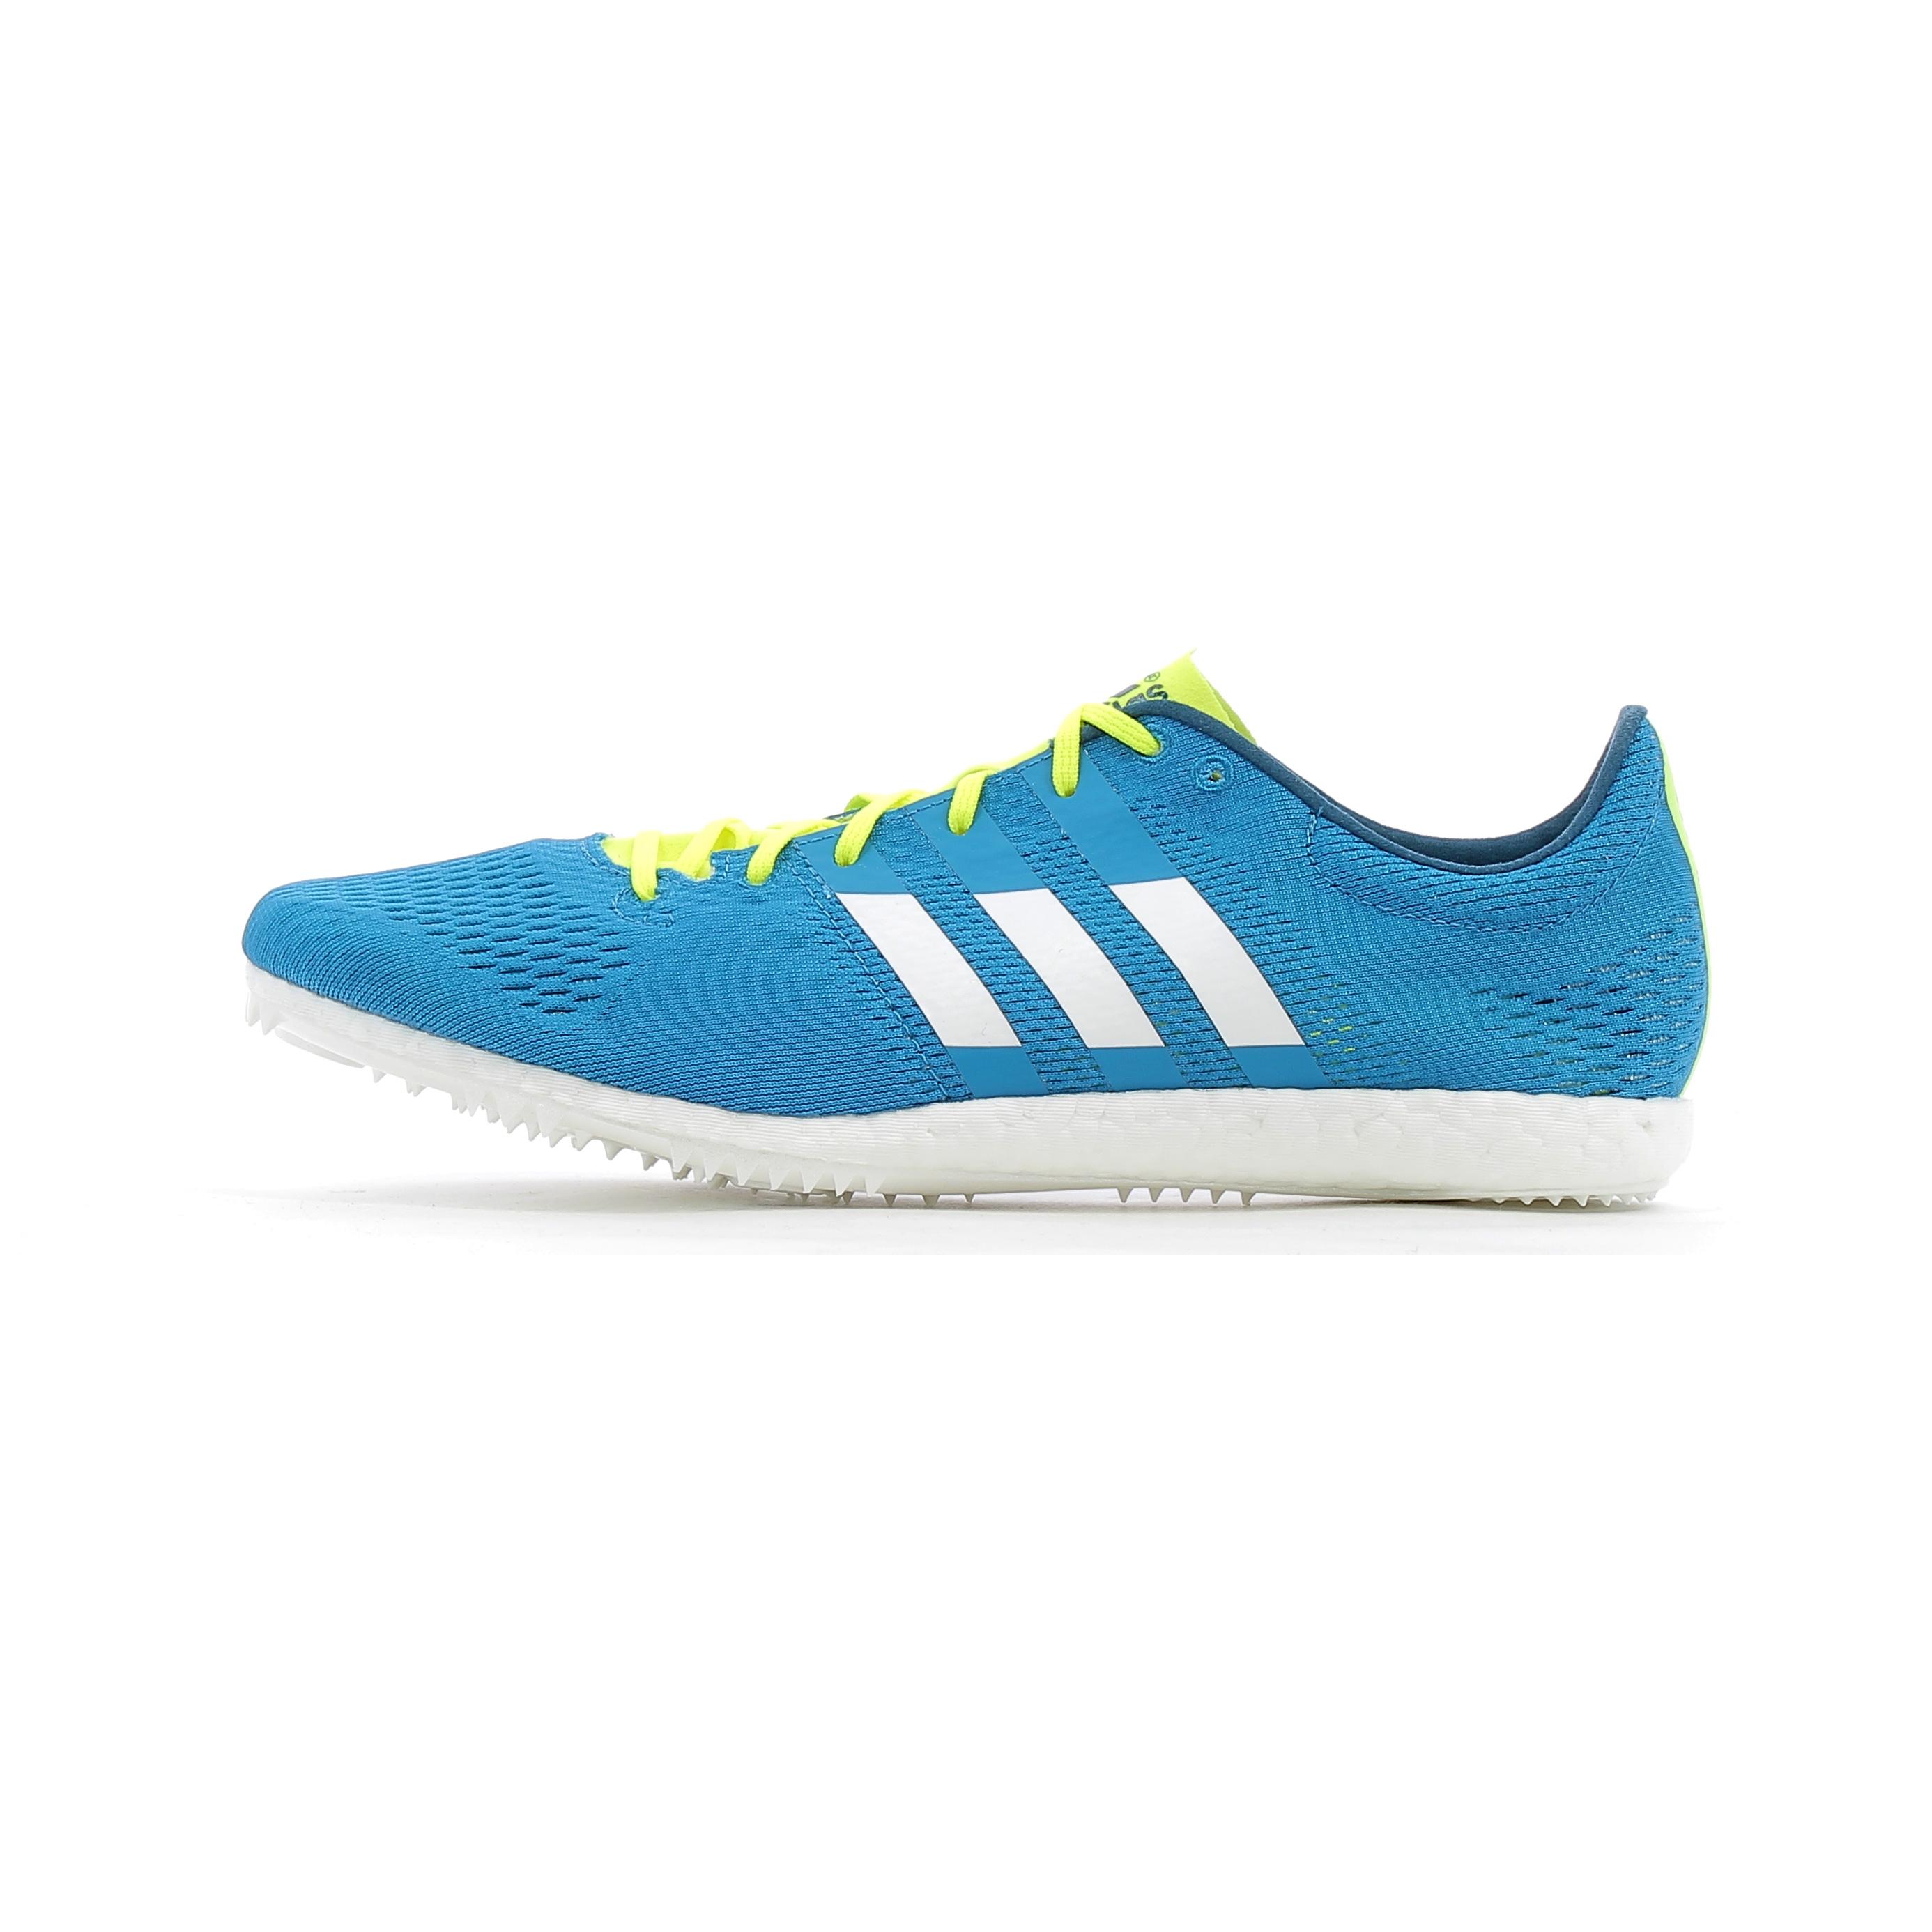 buy online 0224e 14843 Chaussures dAthlétisme adidas running Adizero Avanti Bleu